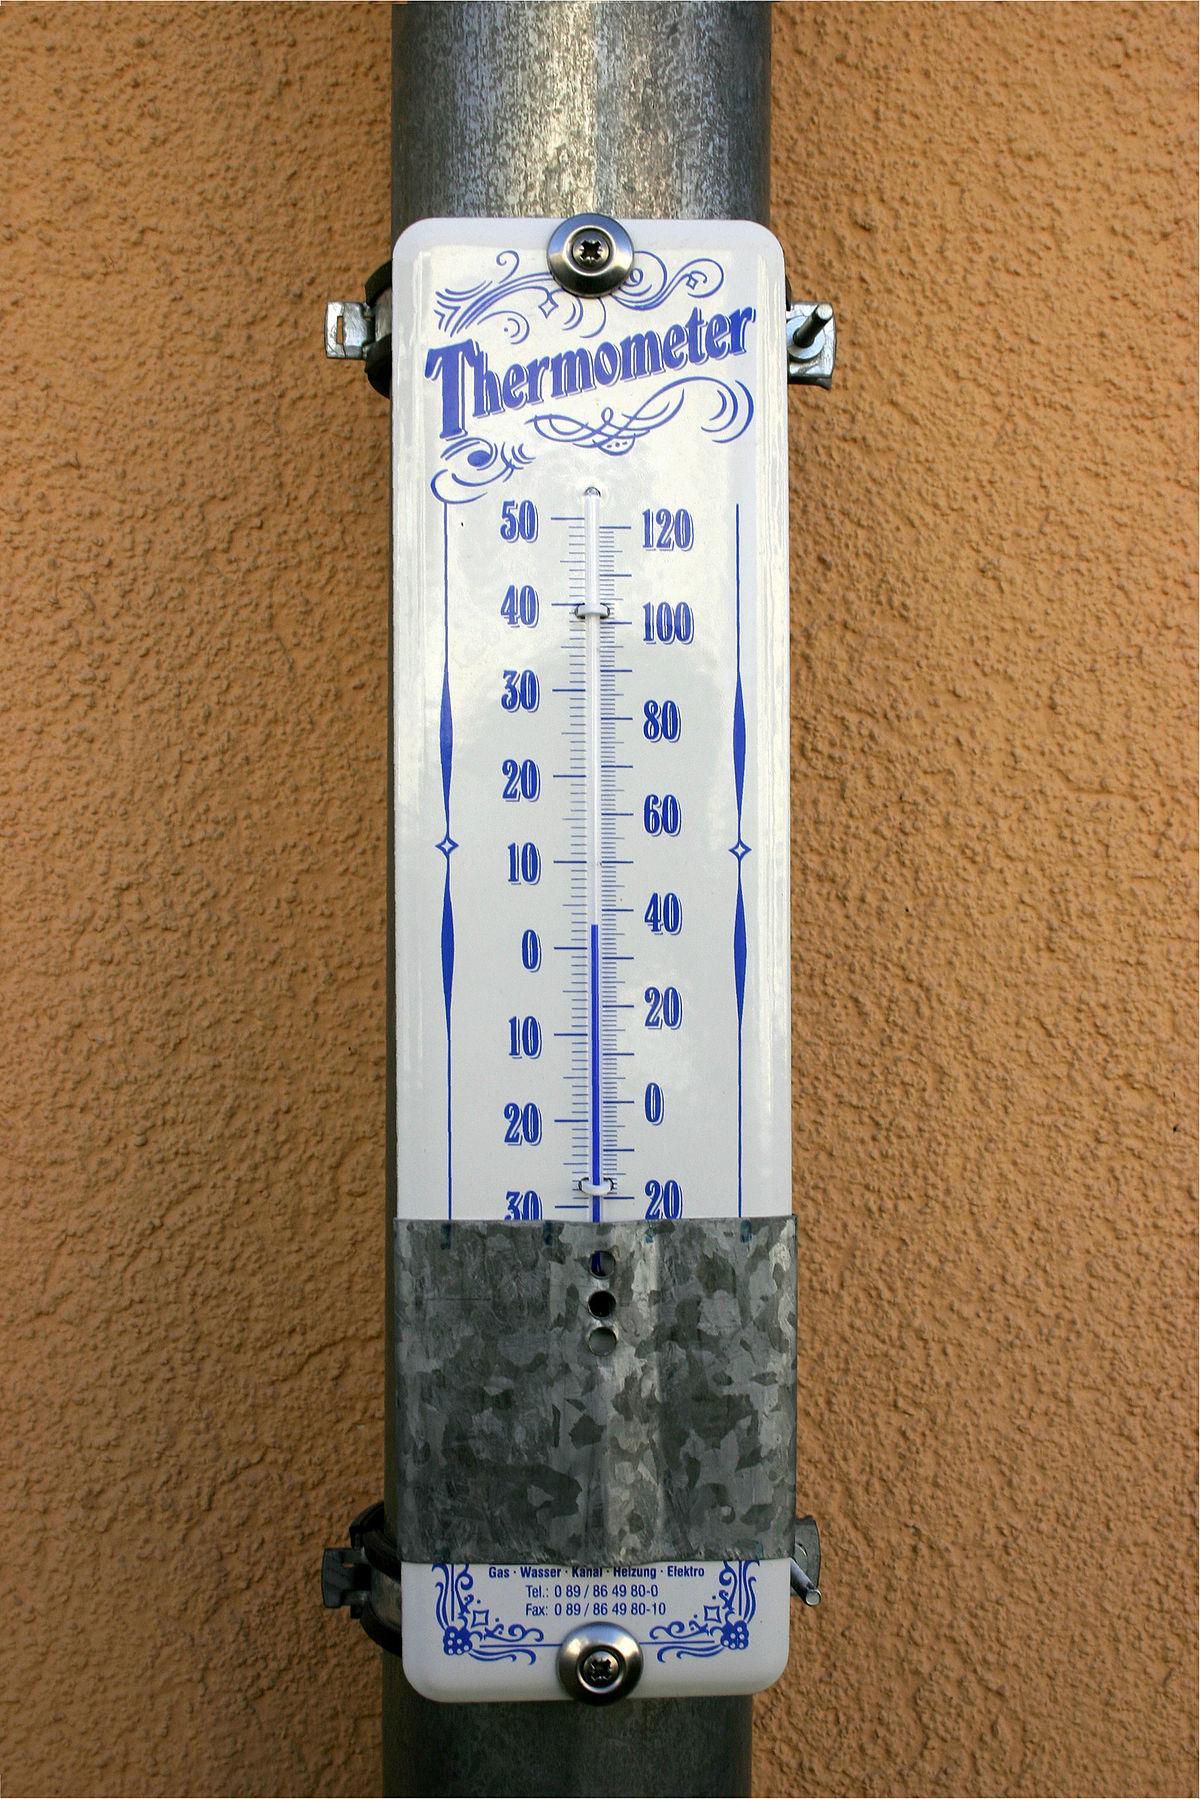 - Thermometer -.jpg